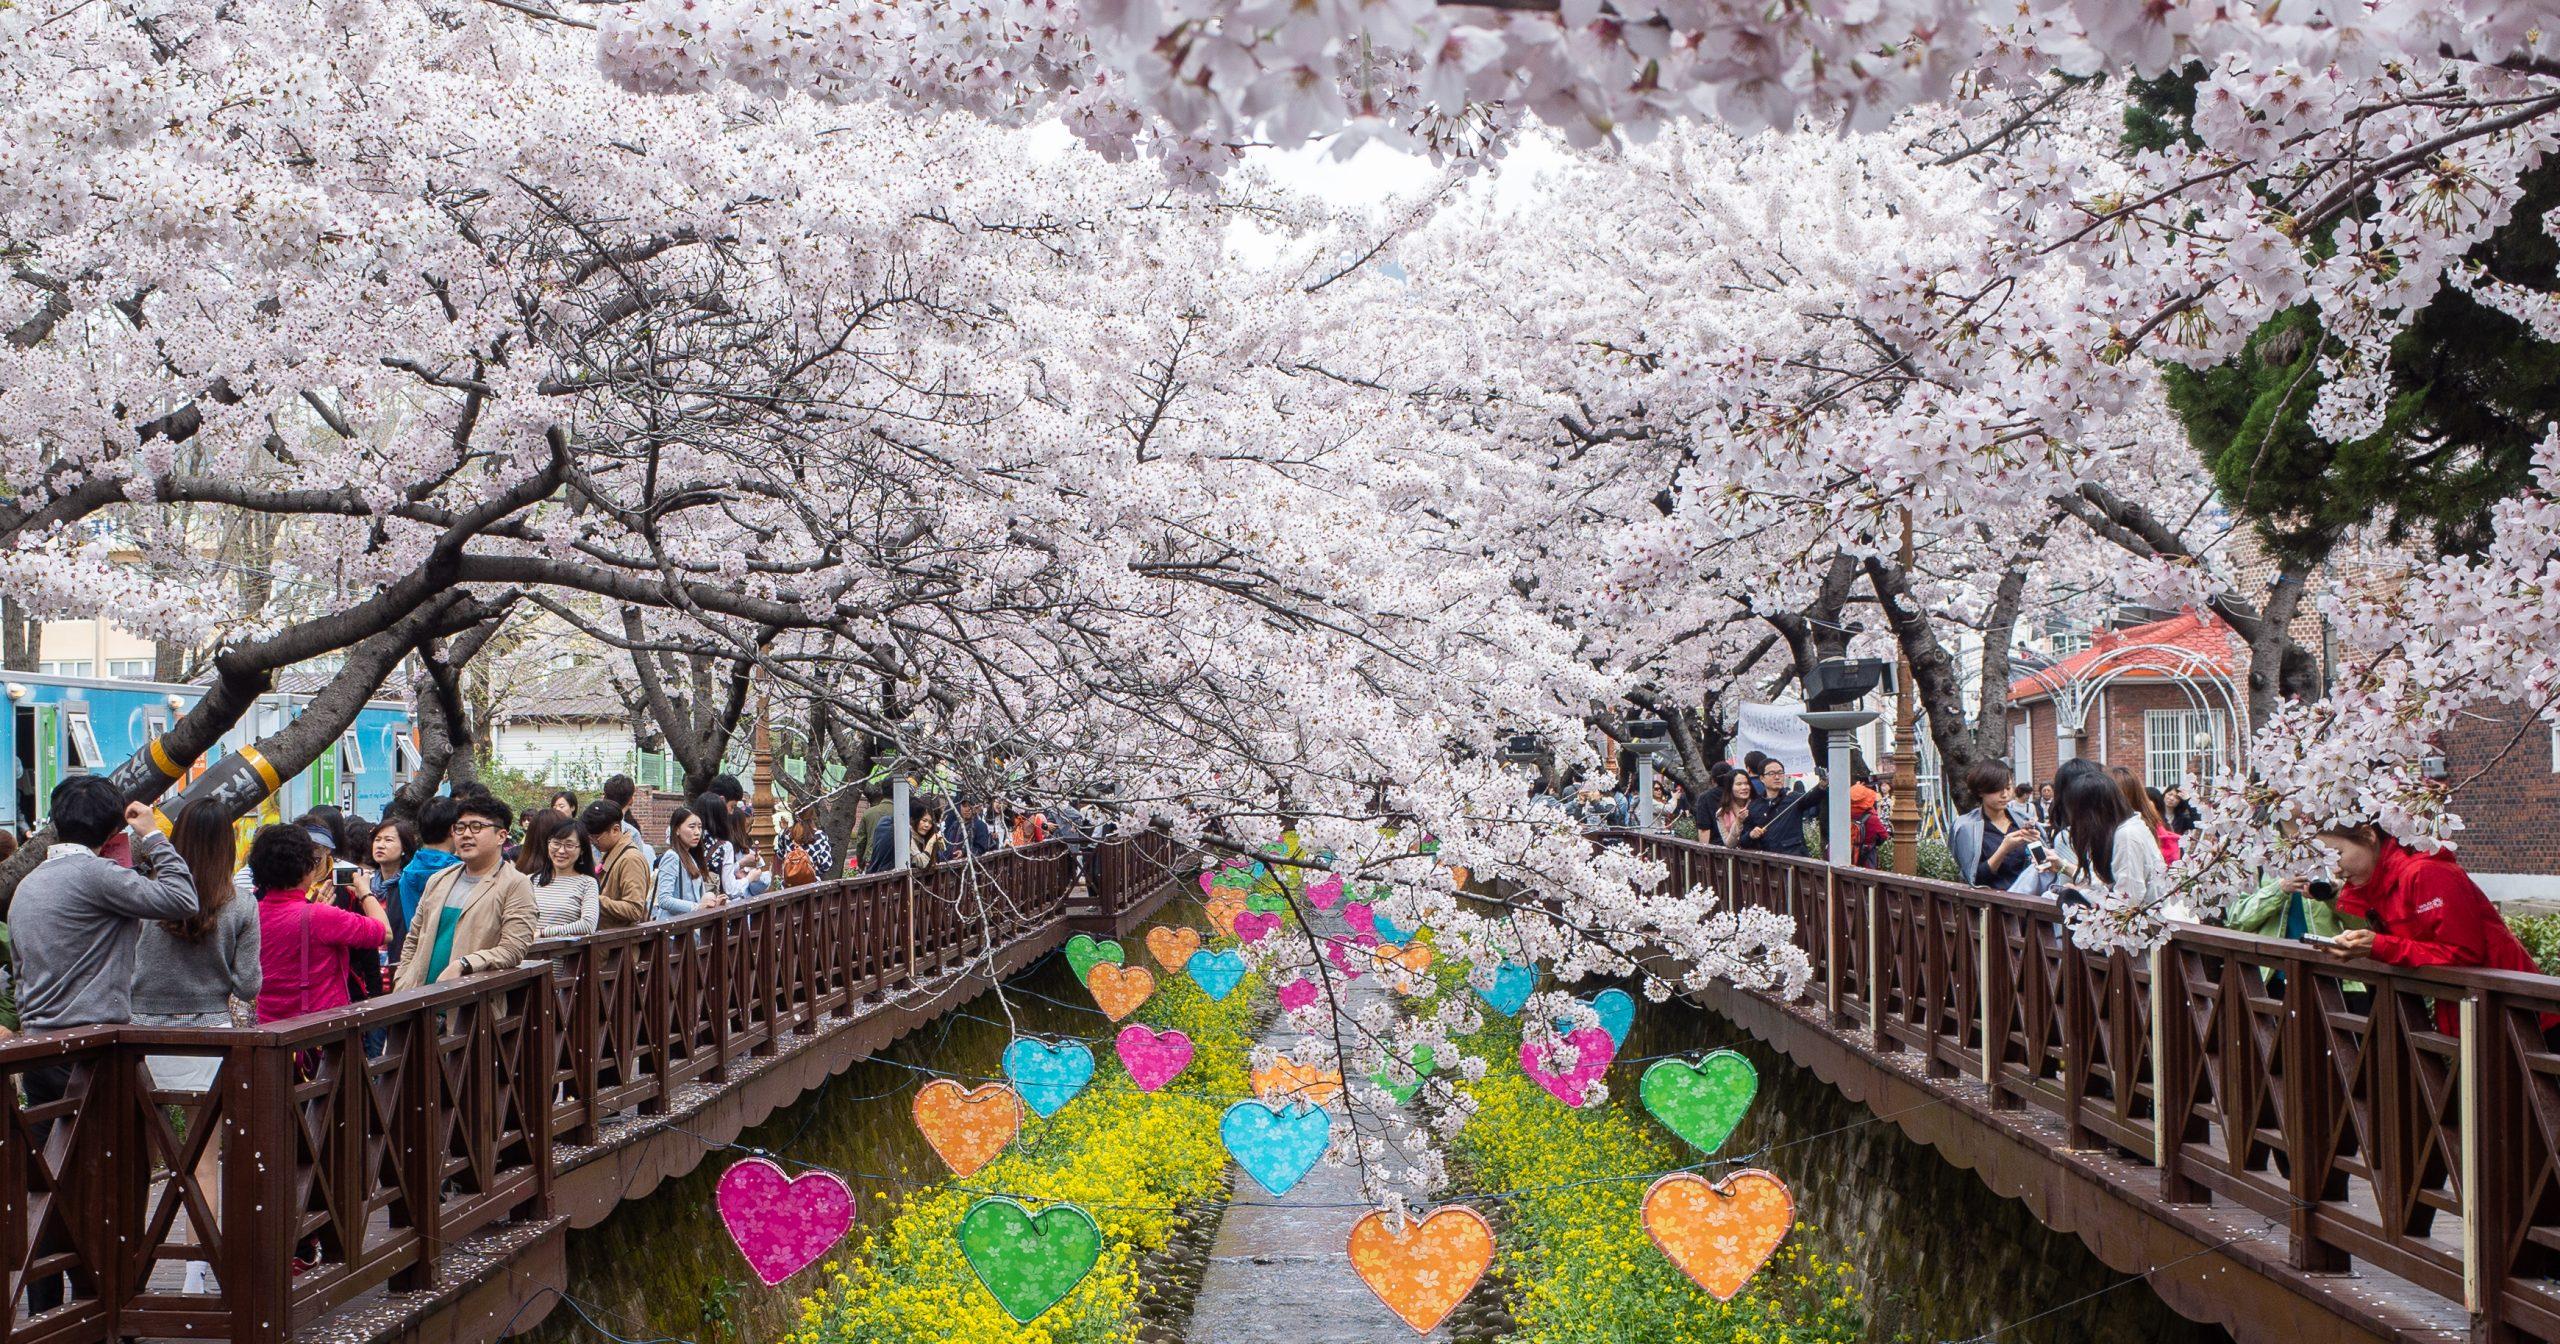 Korea2015-011616-1